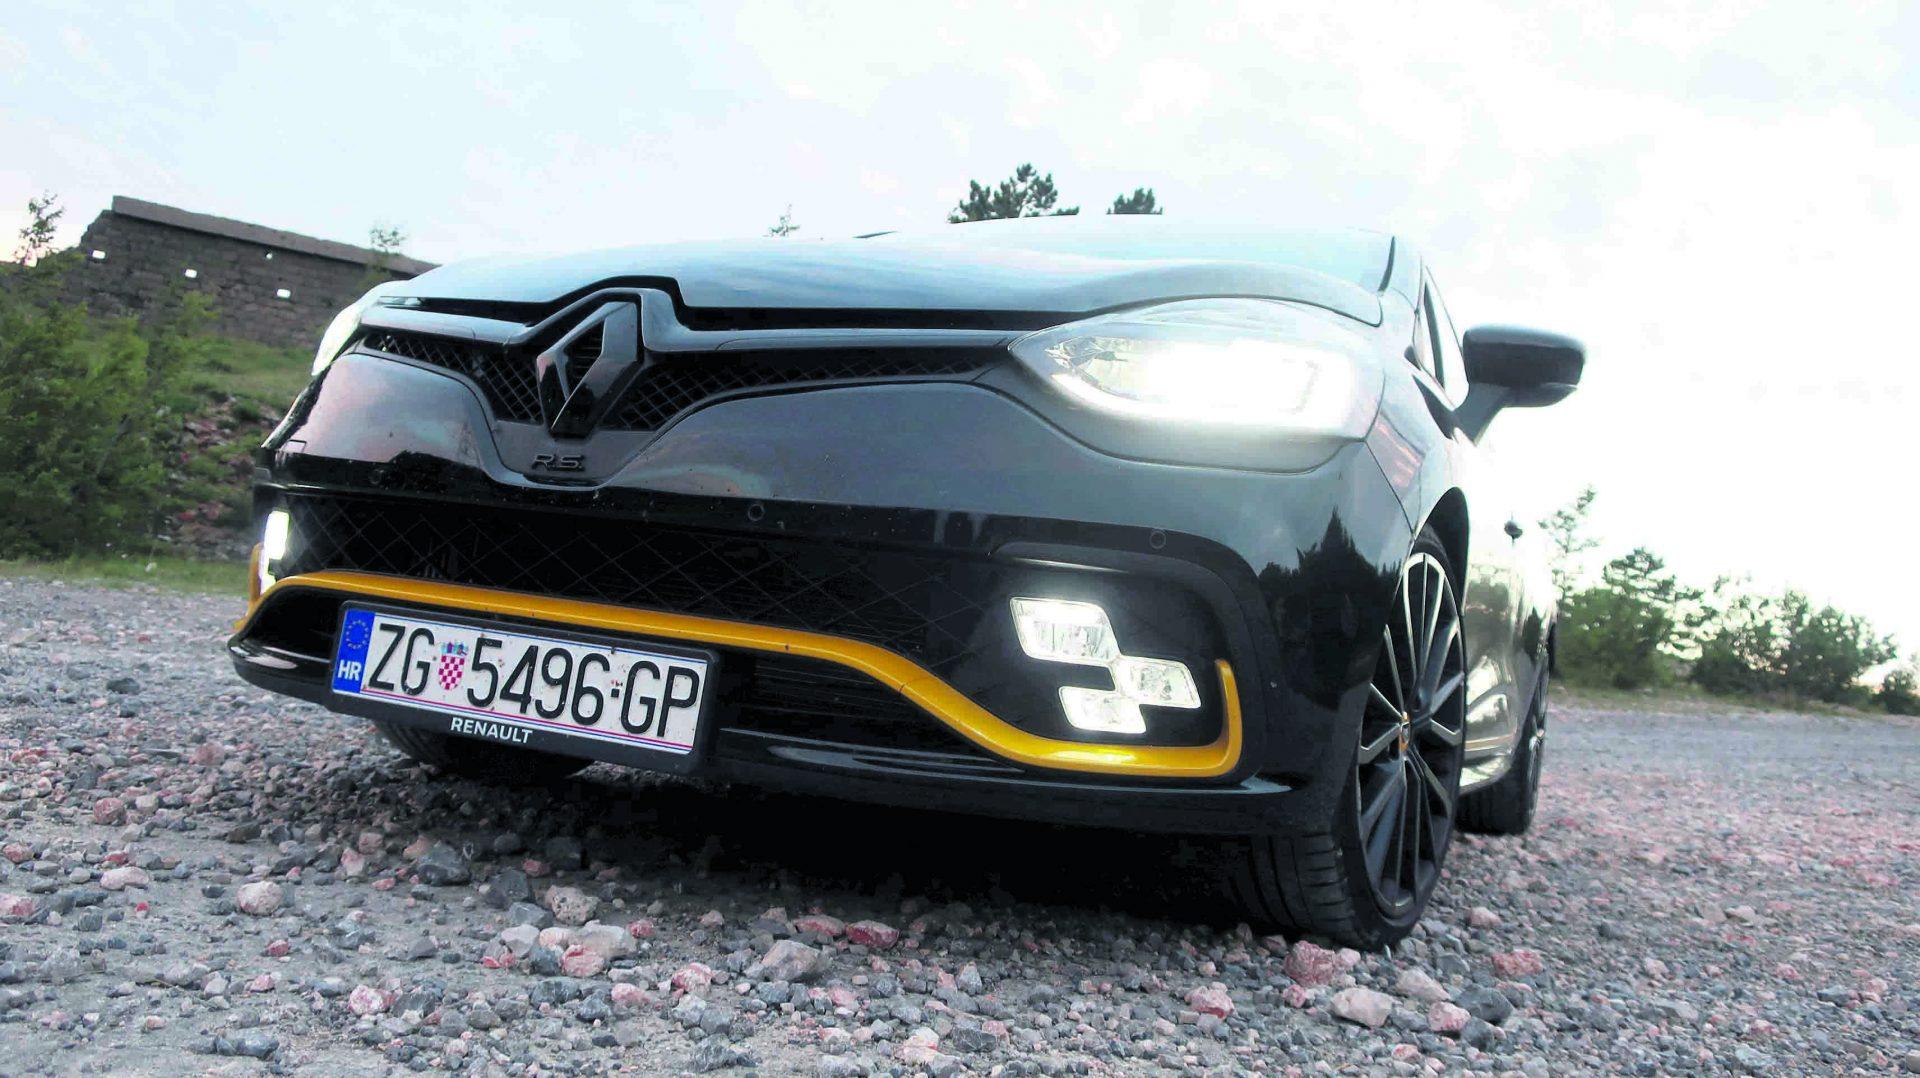 TEST Renault Clio R.S. 18 Energy 220 EDC